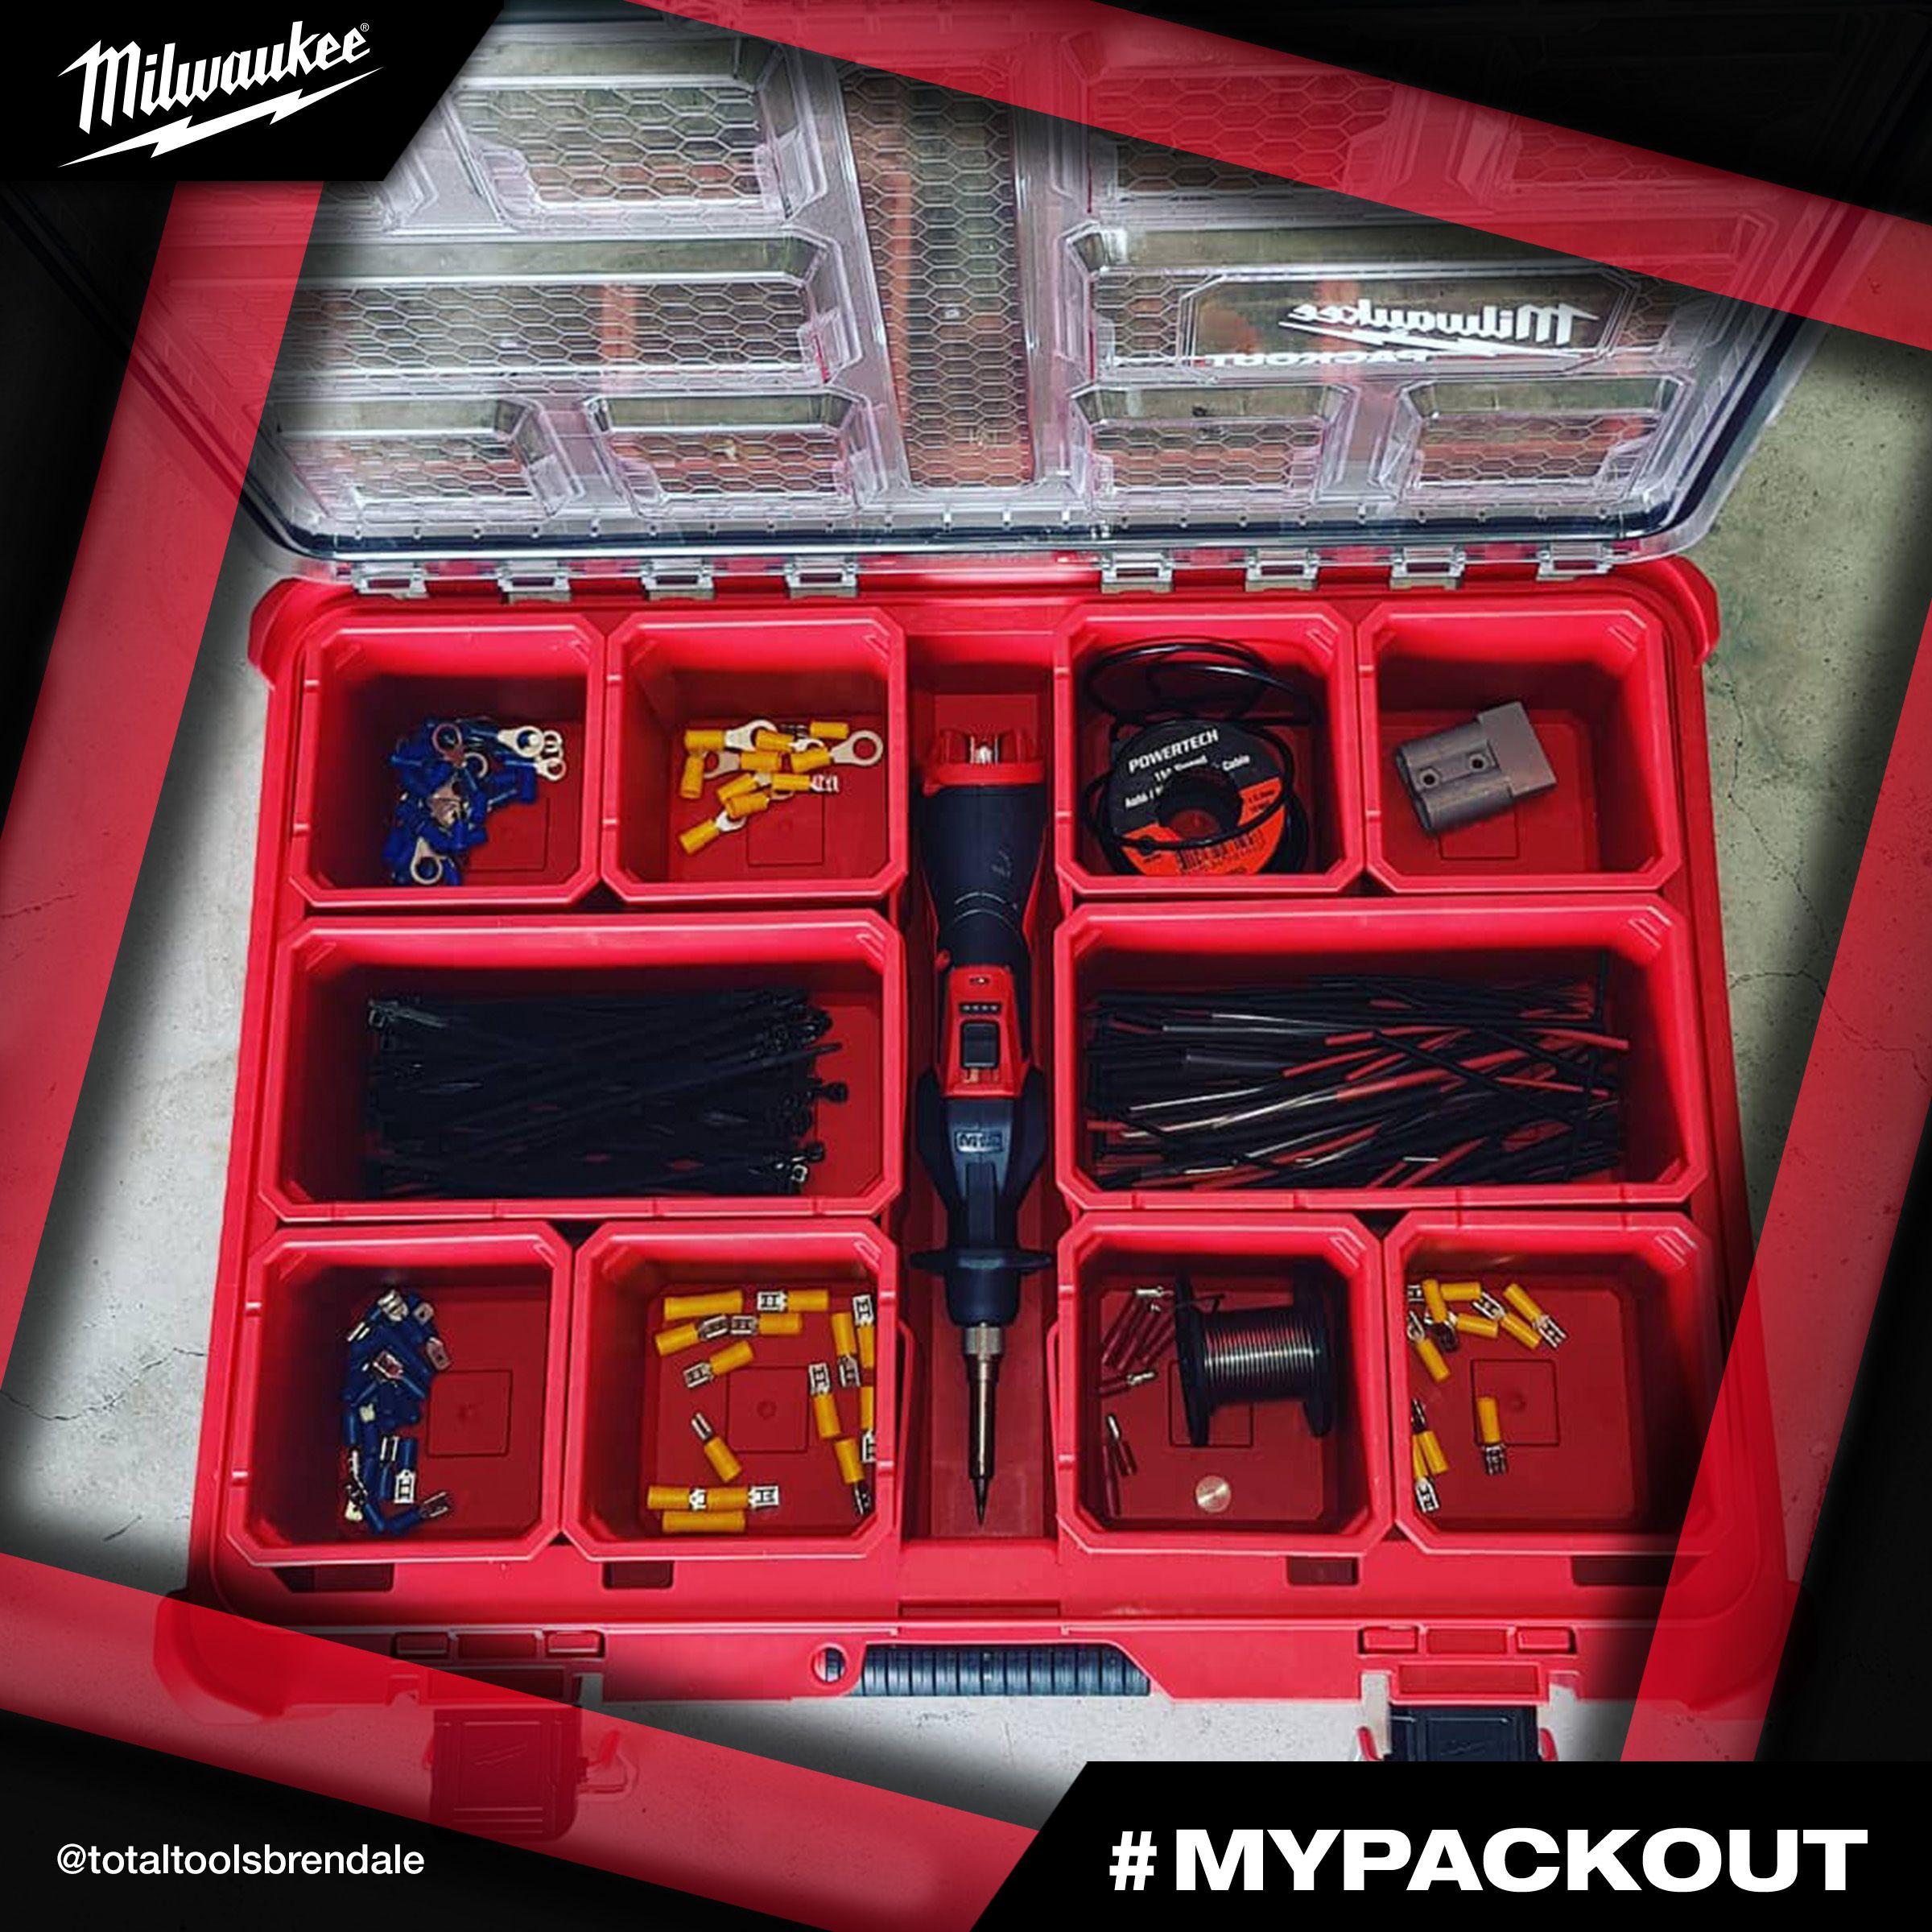 Packout Modular Storage System Photo Credit Totaltoolsbrendale New Milwaukee Tools Milwaukee Tools Milwaukee Tool Box